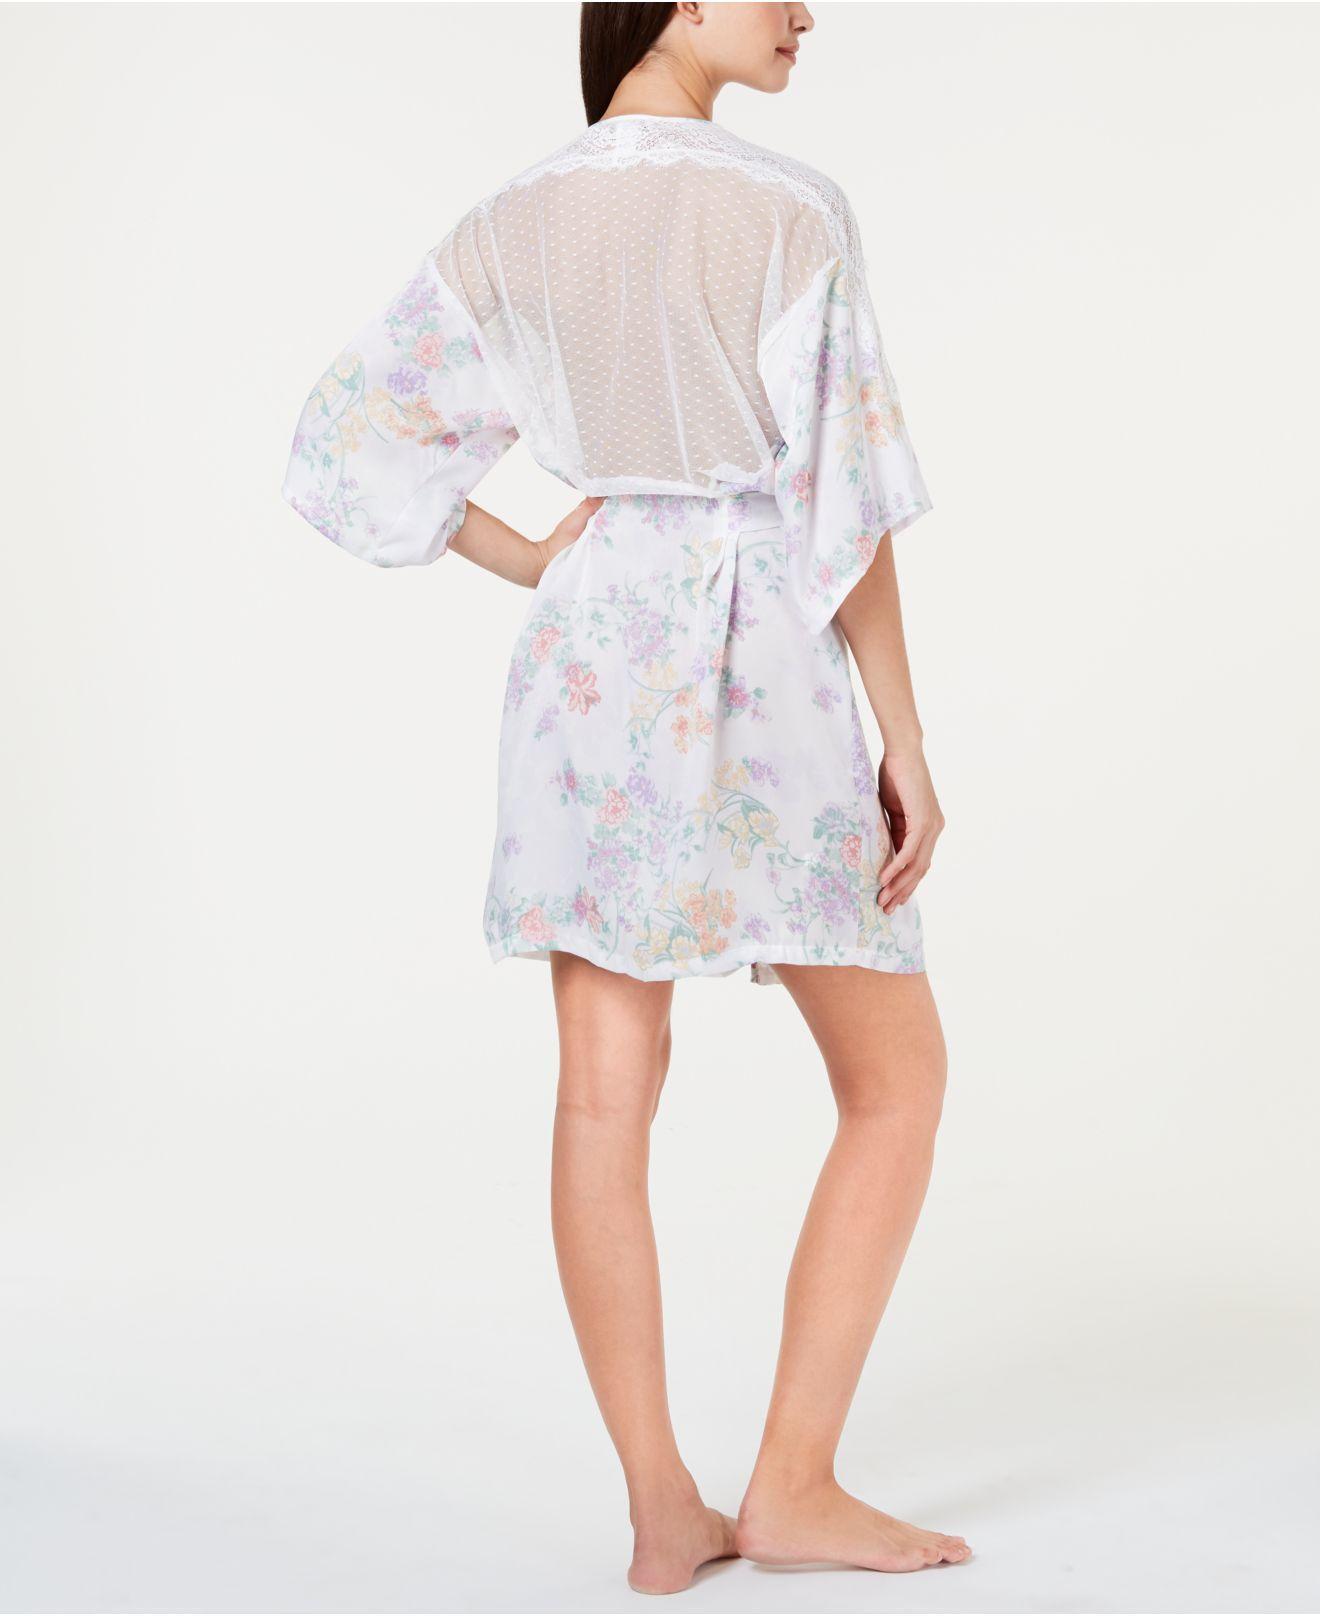 c4aec78982 Lyst - Linea Donatella Luna Bouquet Lace Trim Flower-print Wrap Robe Lub130  in White